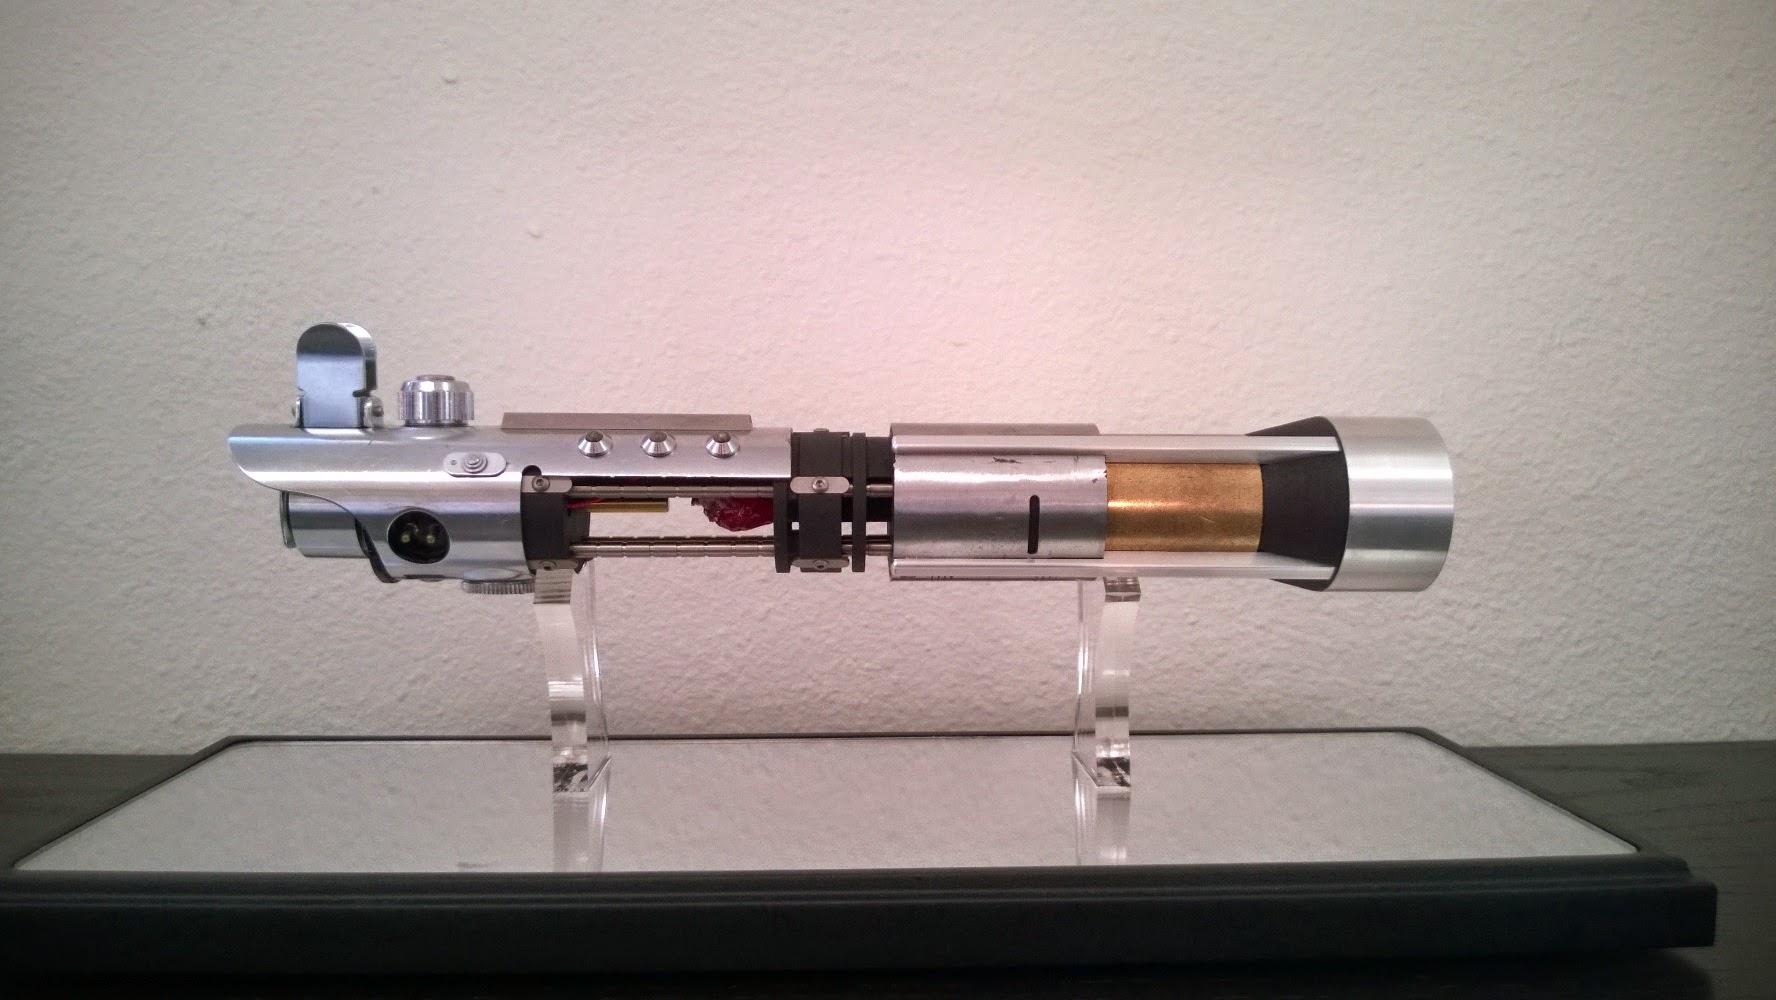 Replica Of Starkiller S Lightsaber 171 Adafruit Industries